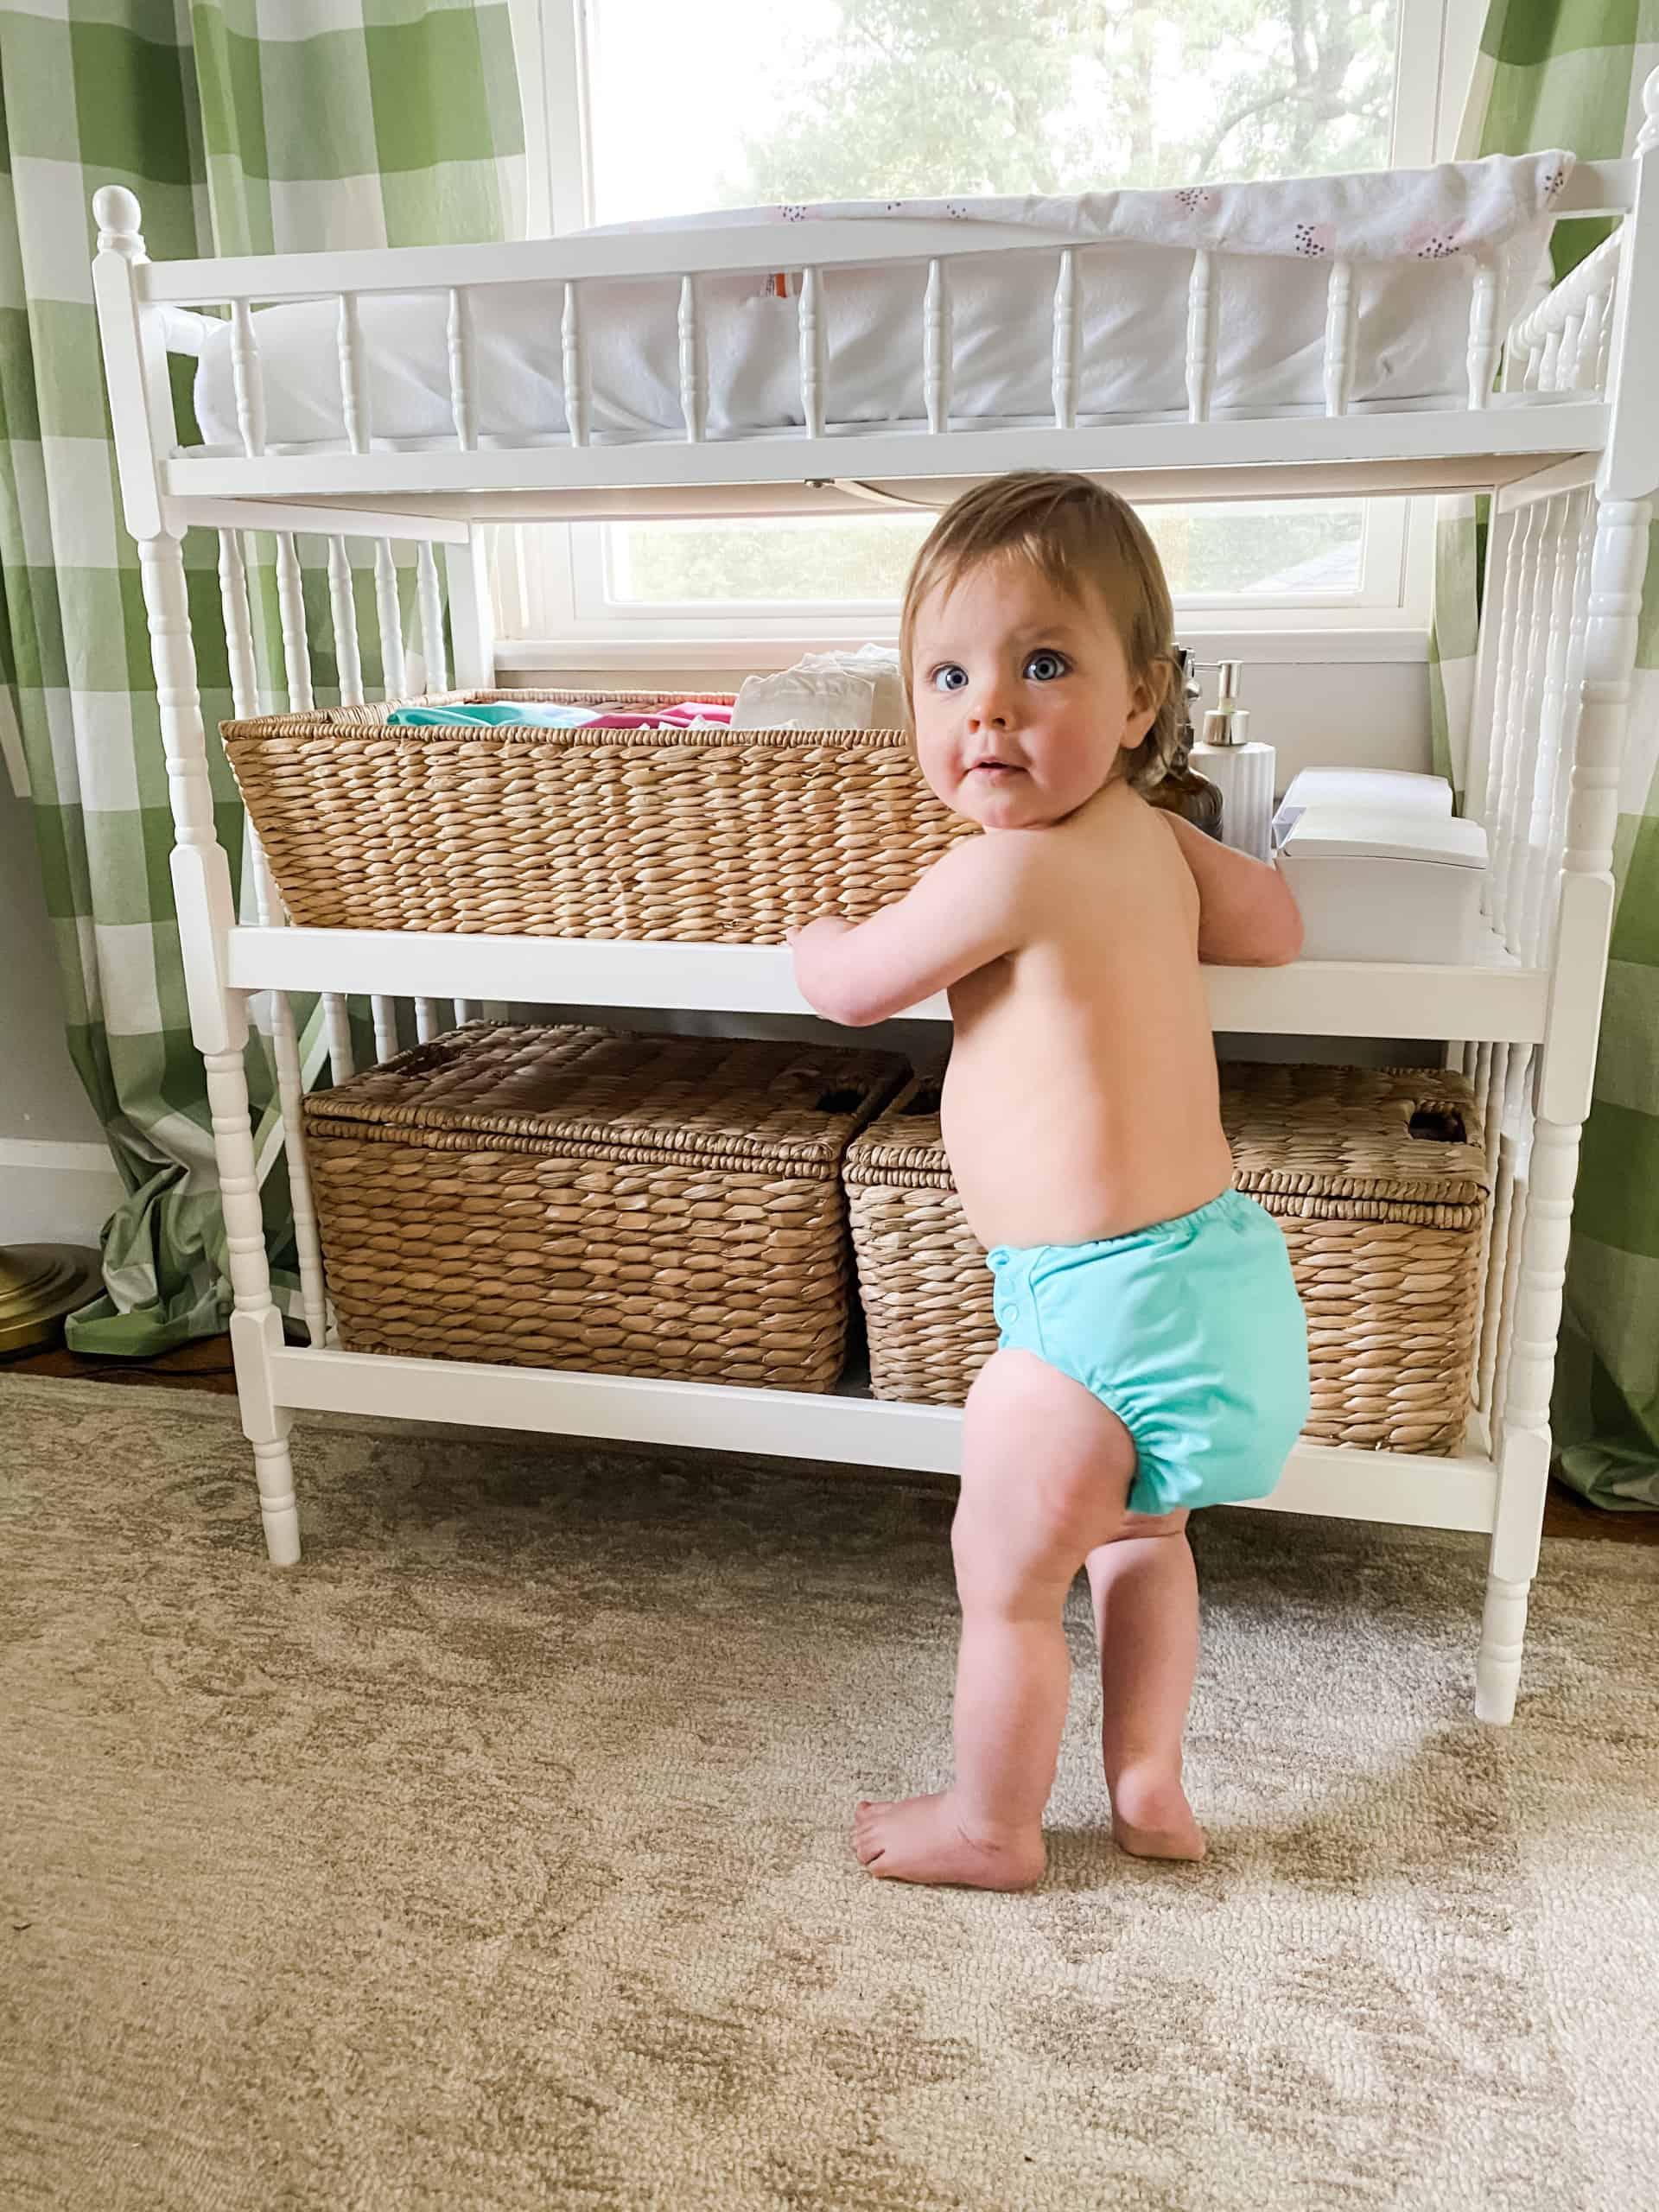 Cloth Diapering 101 #clothdiapers #newmom #motherhood